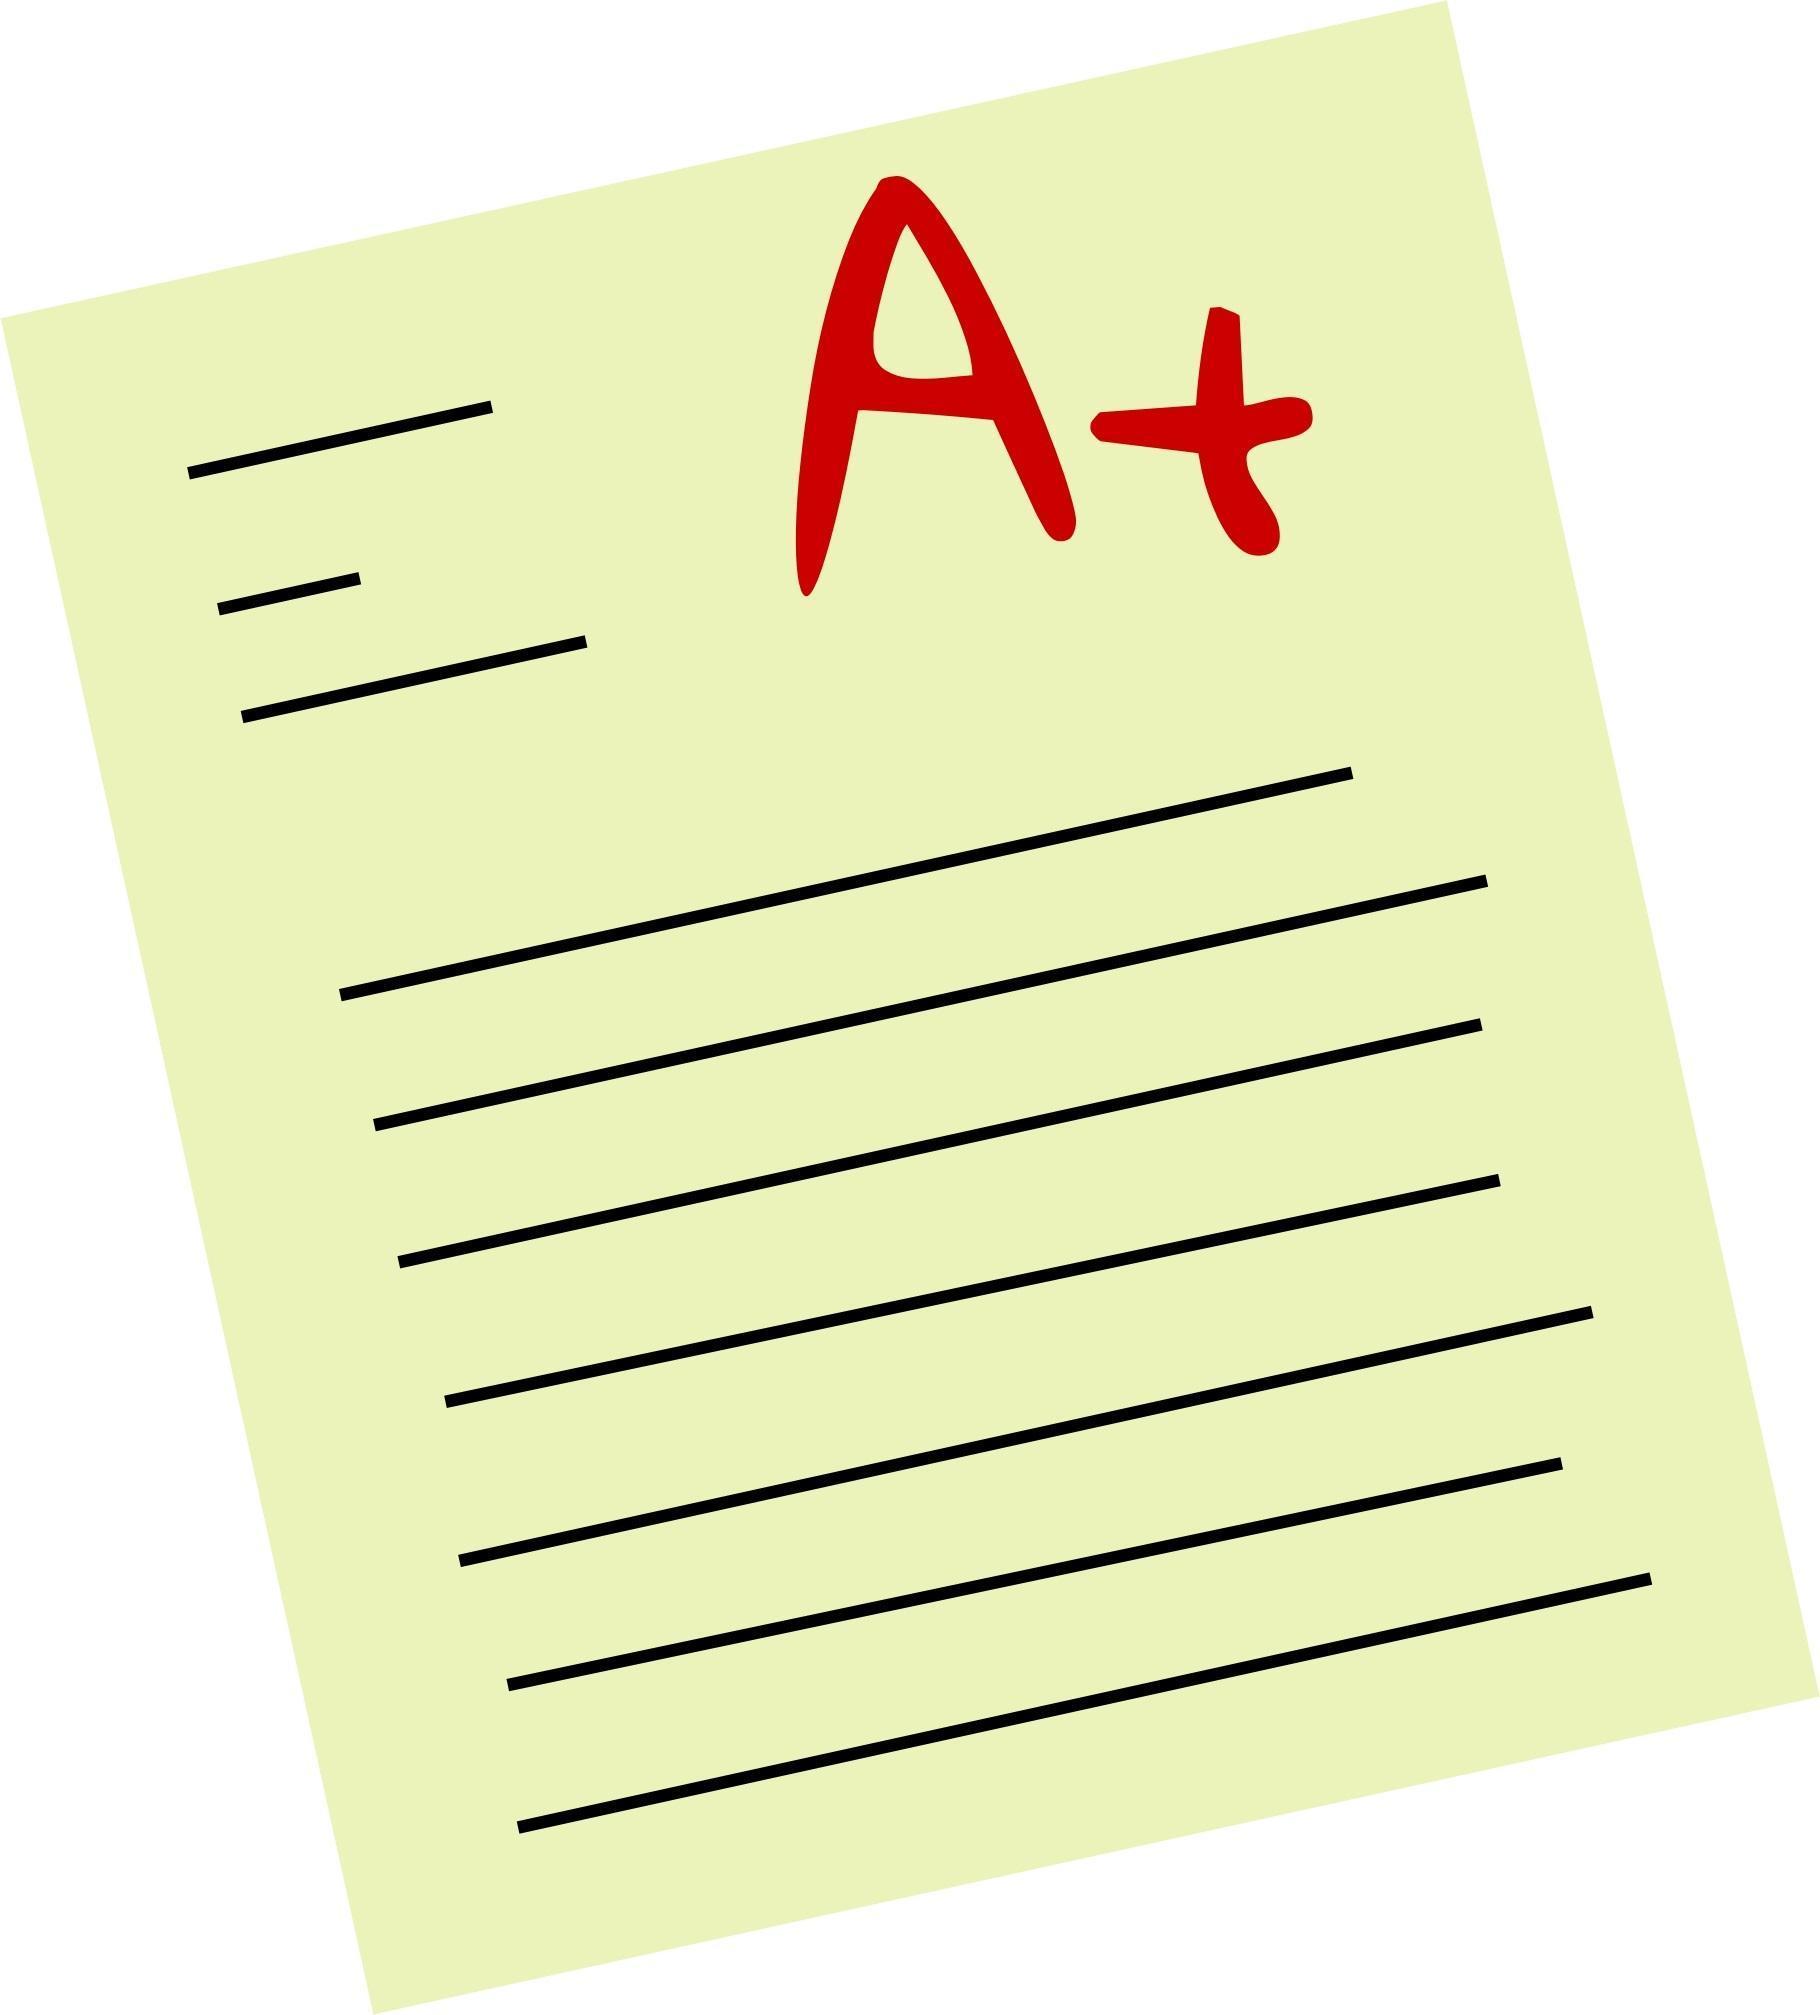 Grades clipart png freeuse stock Good grades clipart 4 » Clipart Portal png freeuse stock